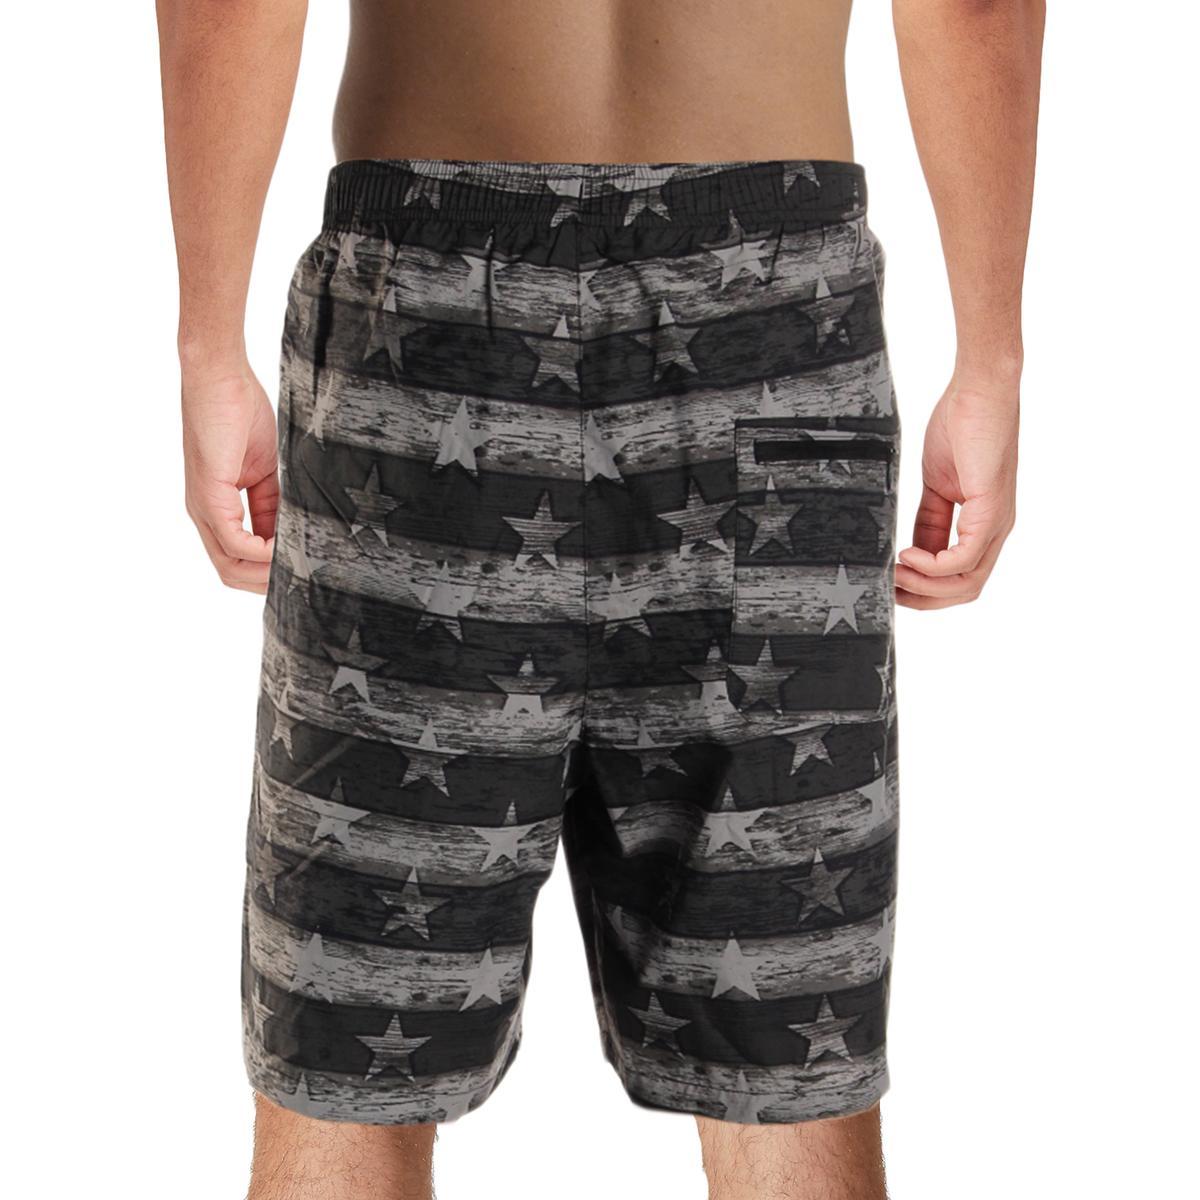 Columbia-Mens-Big-Dippers-Printed-Swim-Trunks-Swimsuit-Big-amp-Tall-BHFO-5580 thumbnail 4